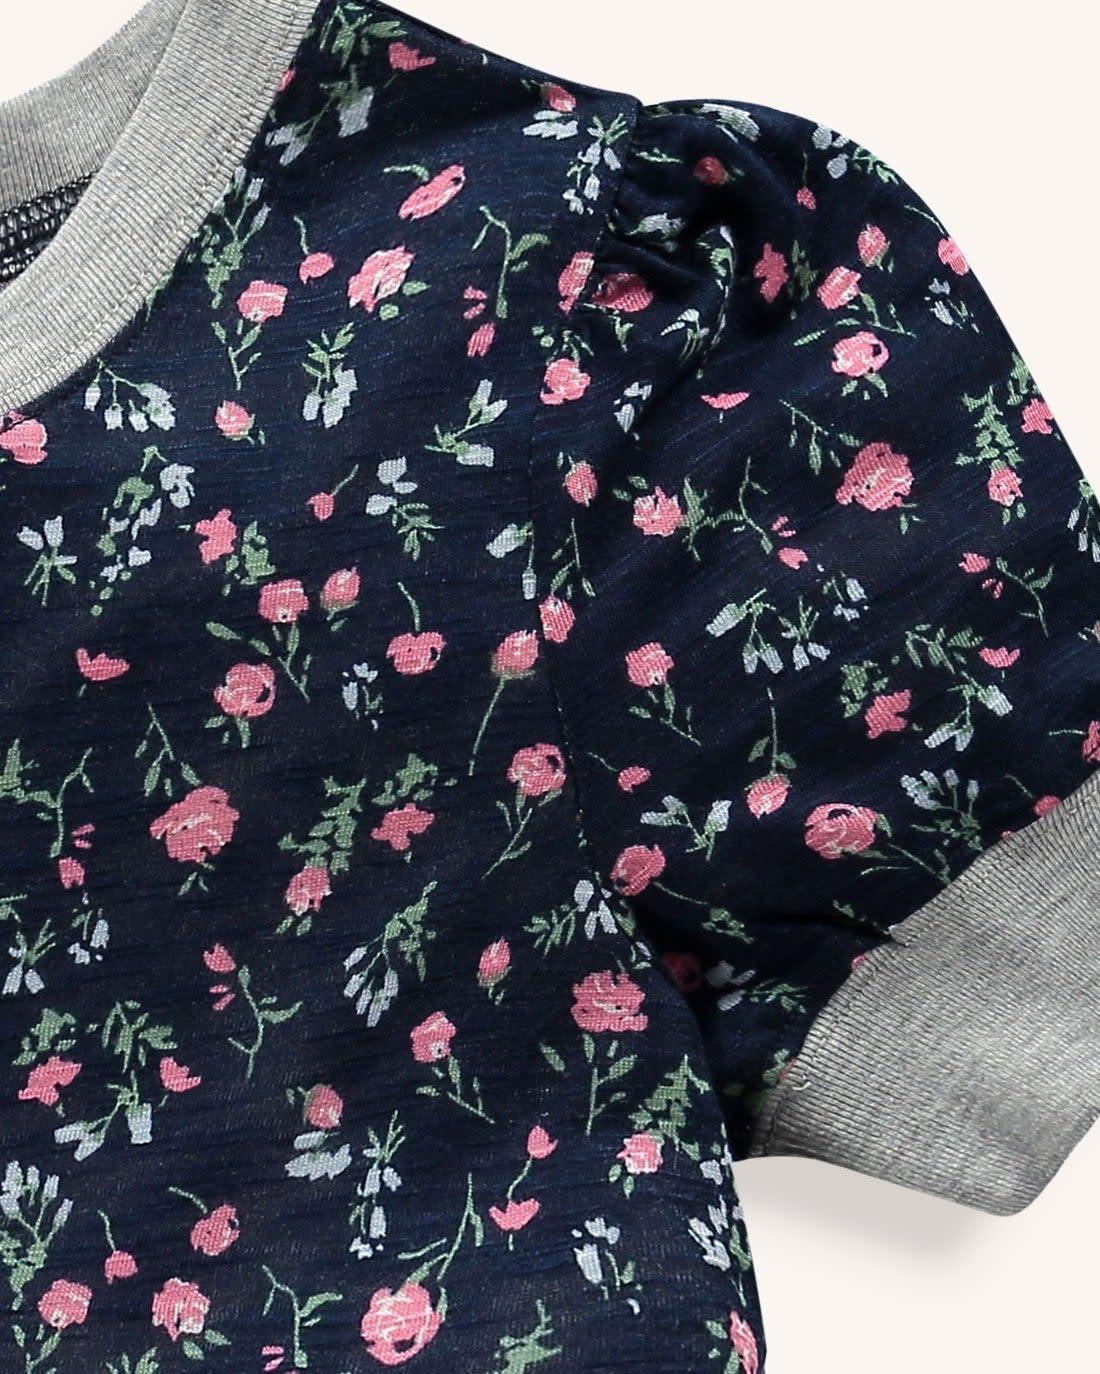 Splendid Phantom Floral Dress